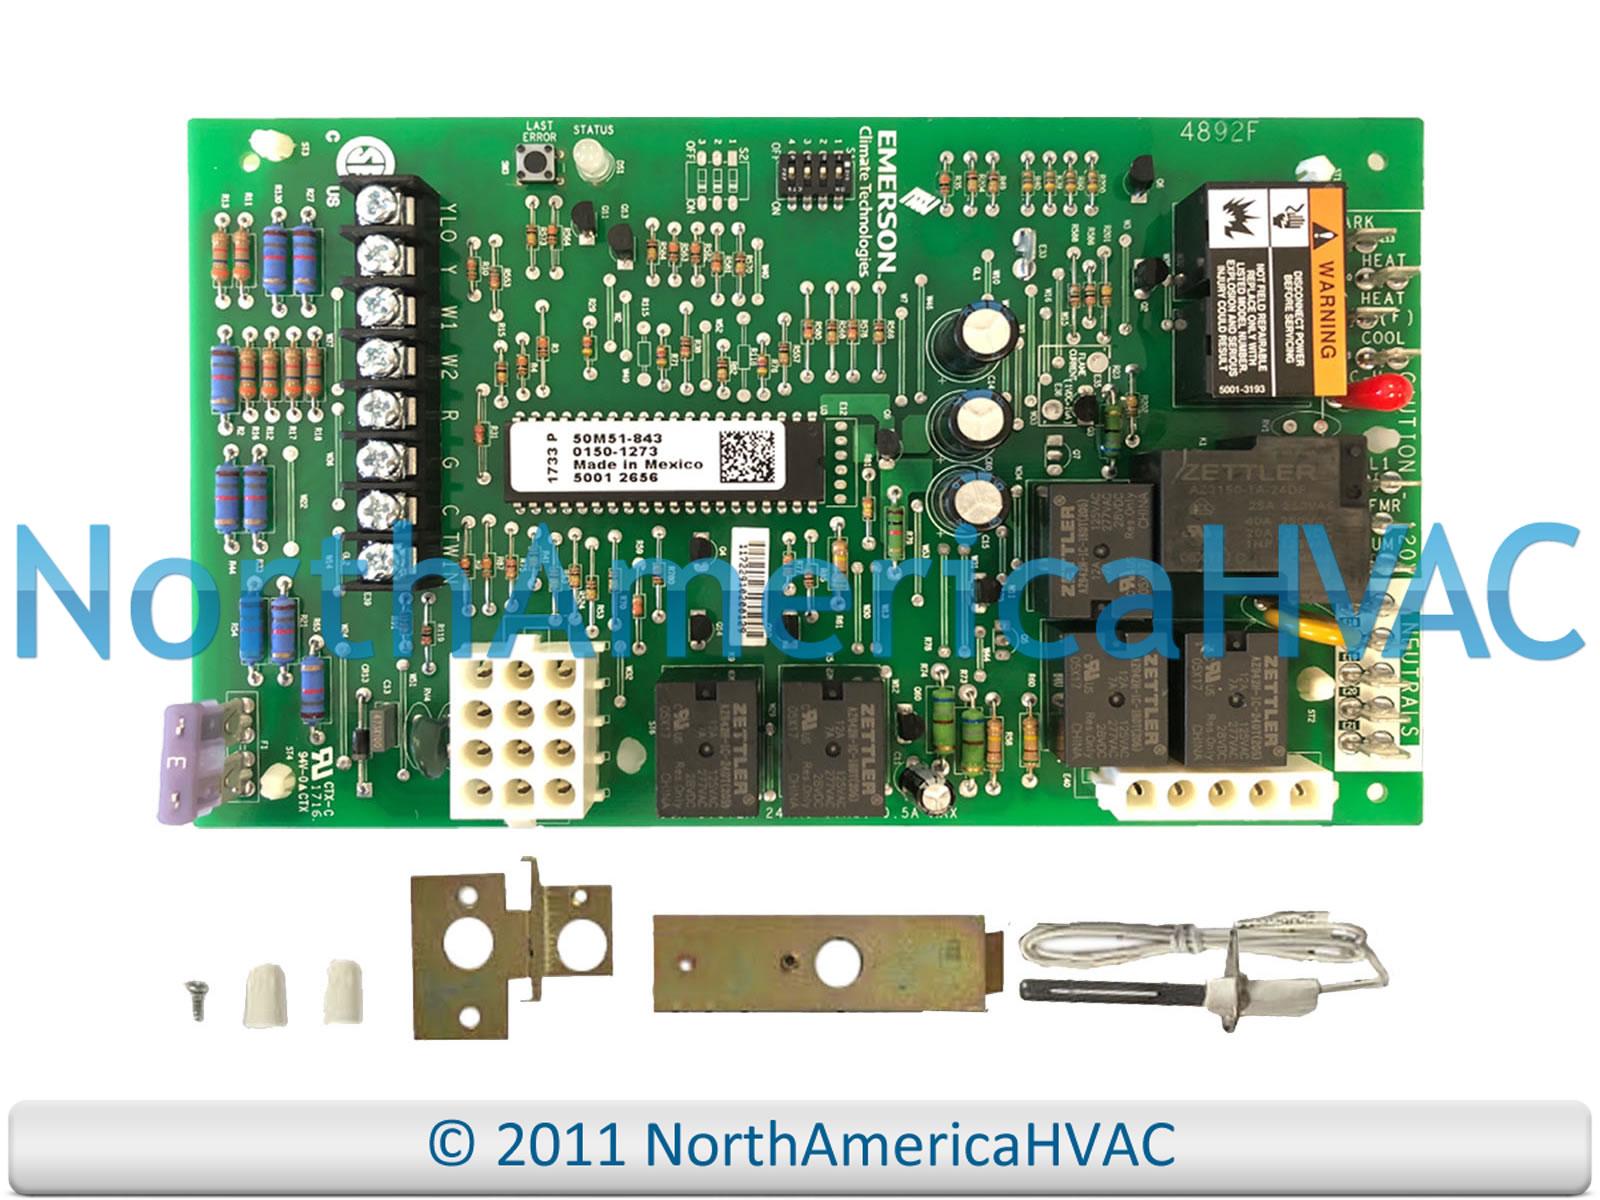 goodman amana janitrol furnace 2 stage control circuit boardimage is loading goodman amana janitrol furnace 2 stage control circuit